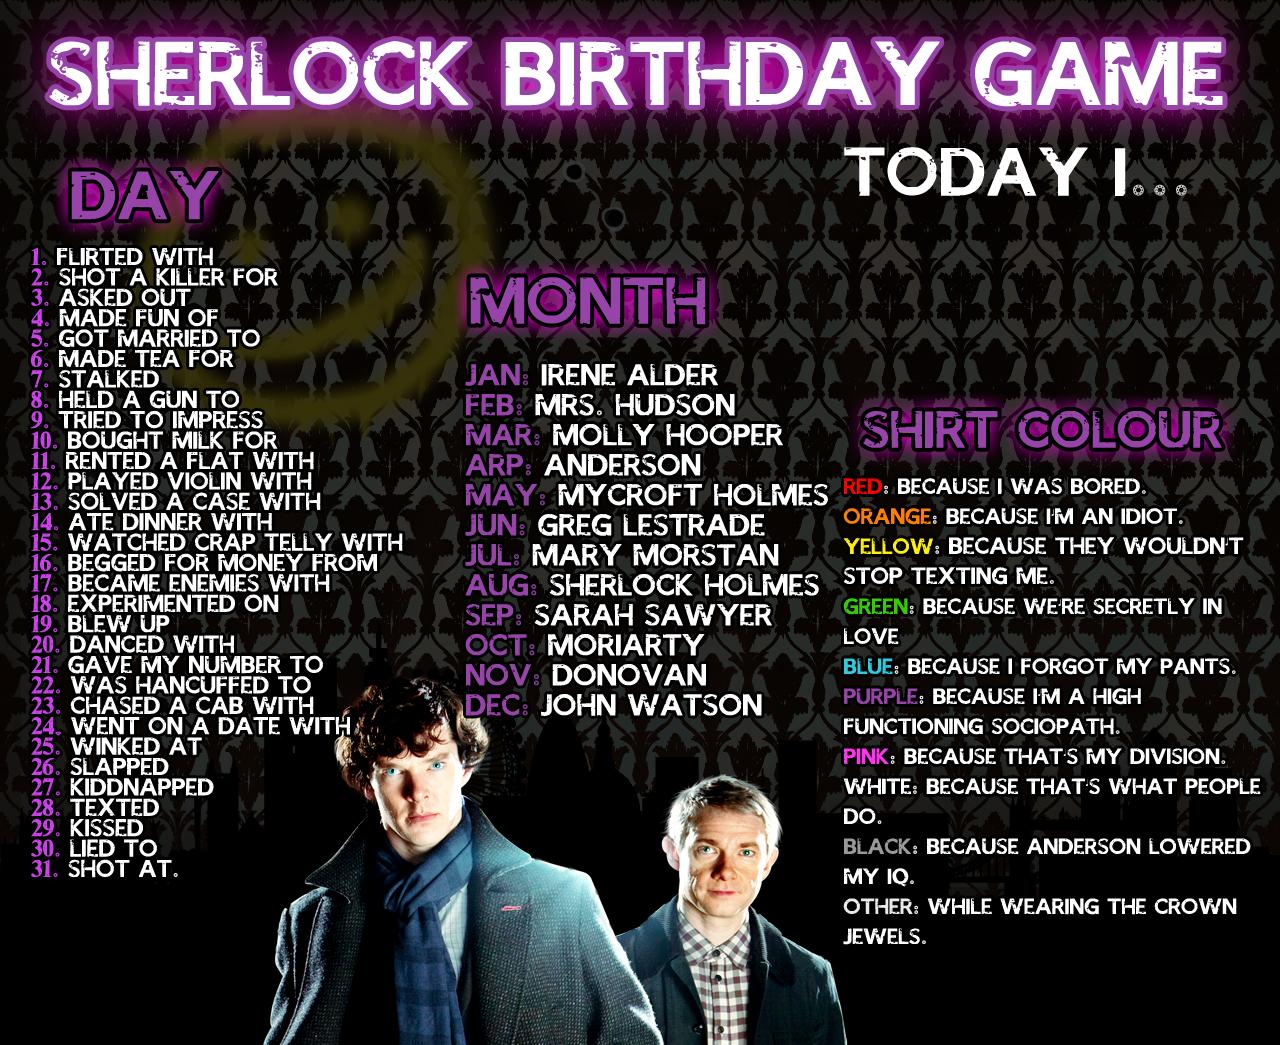 Sherlock Birthday Meme by AgentLaufeyson on DeviantArt